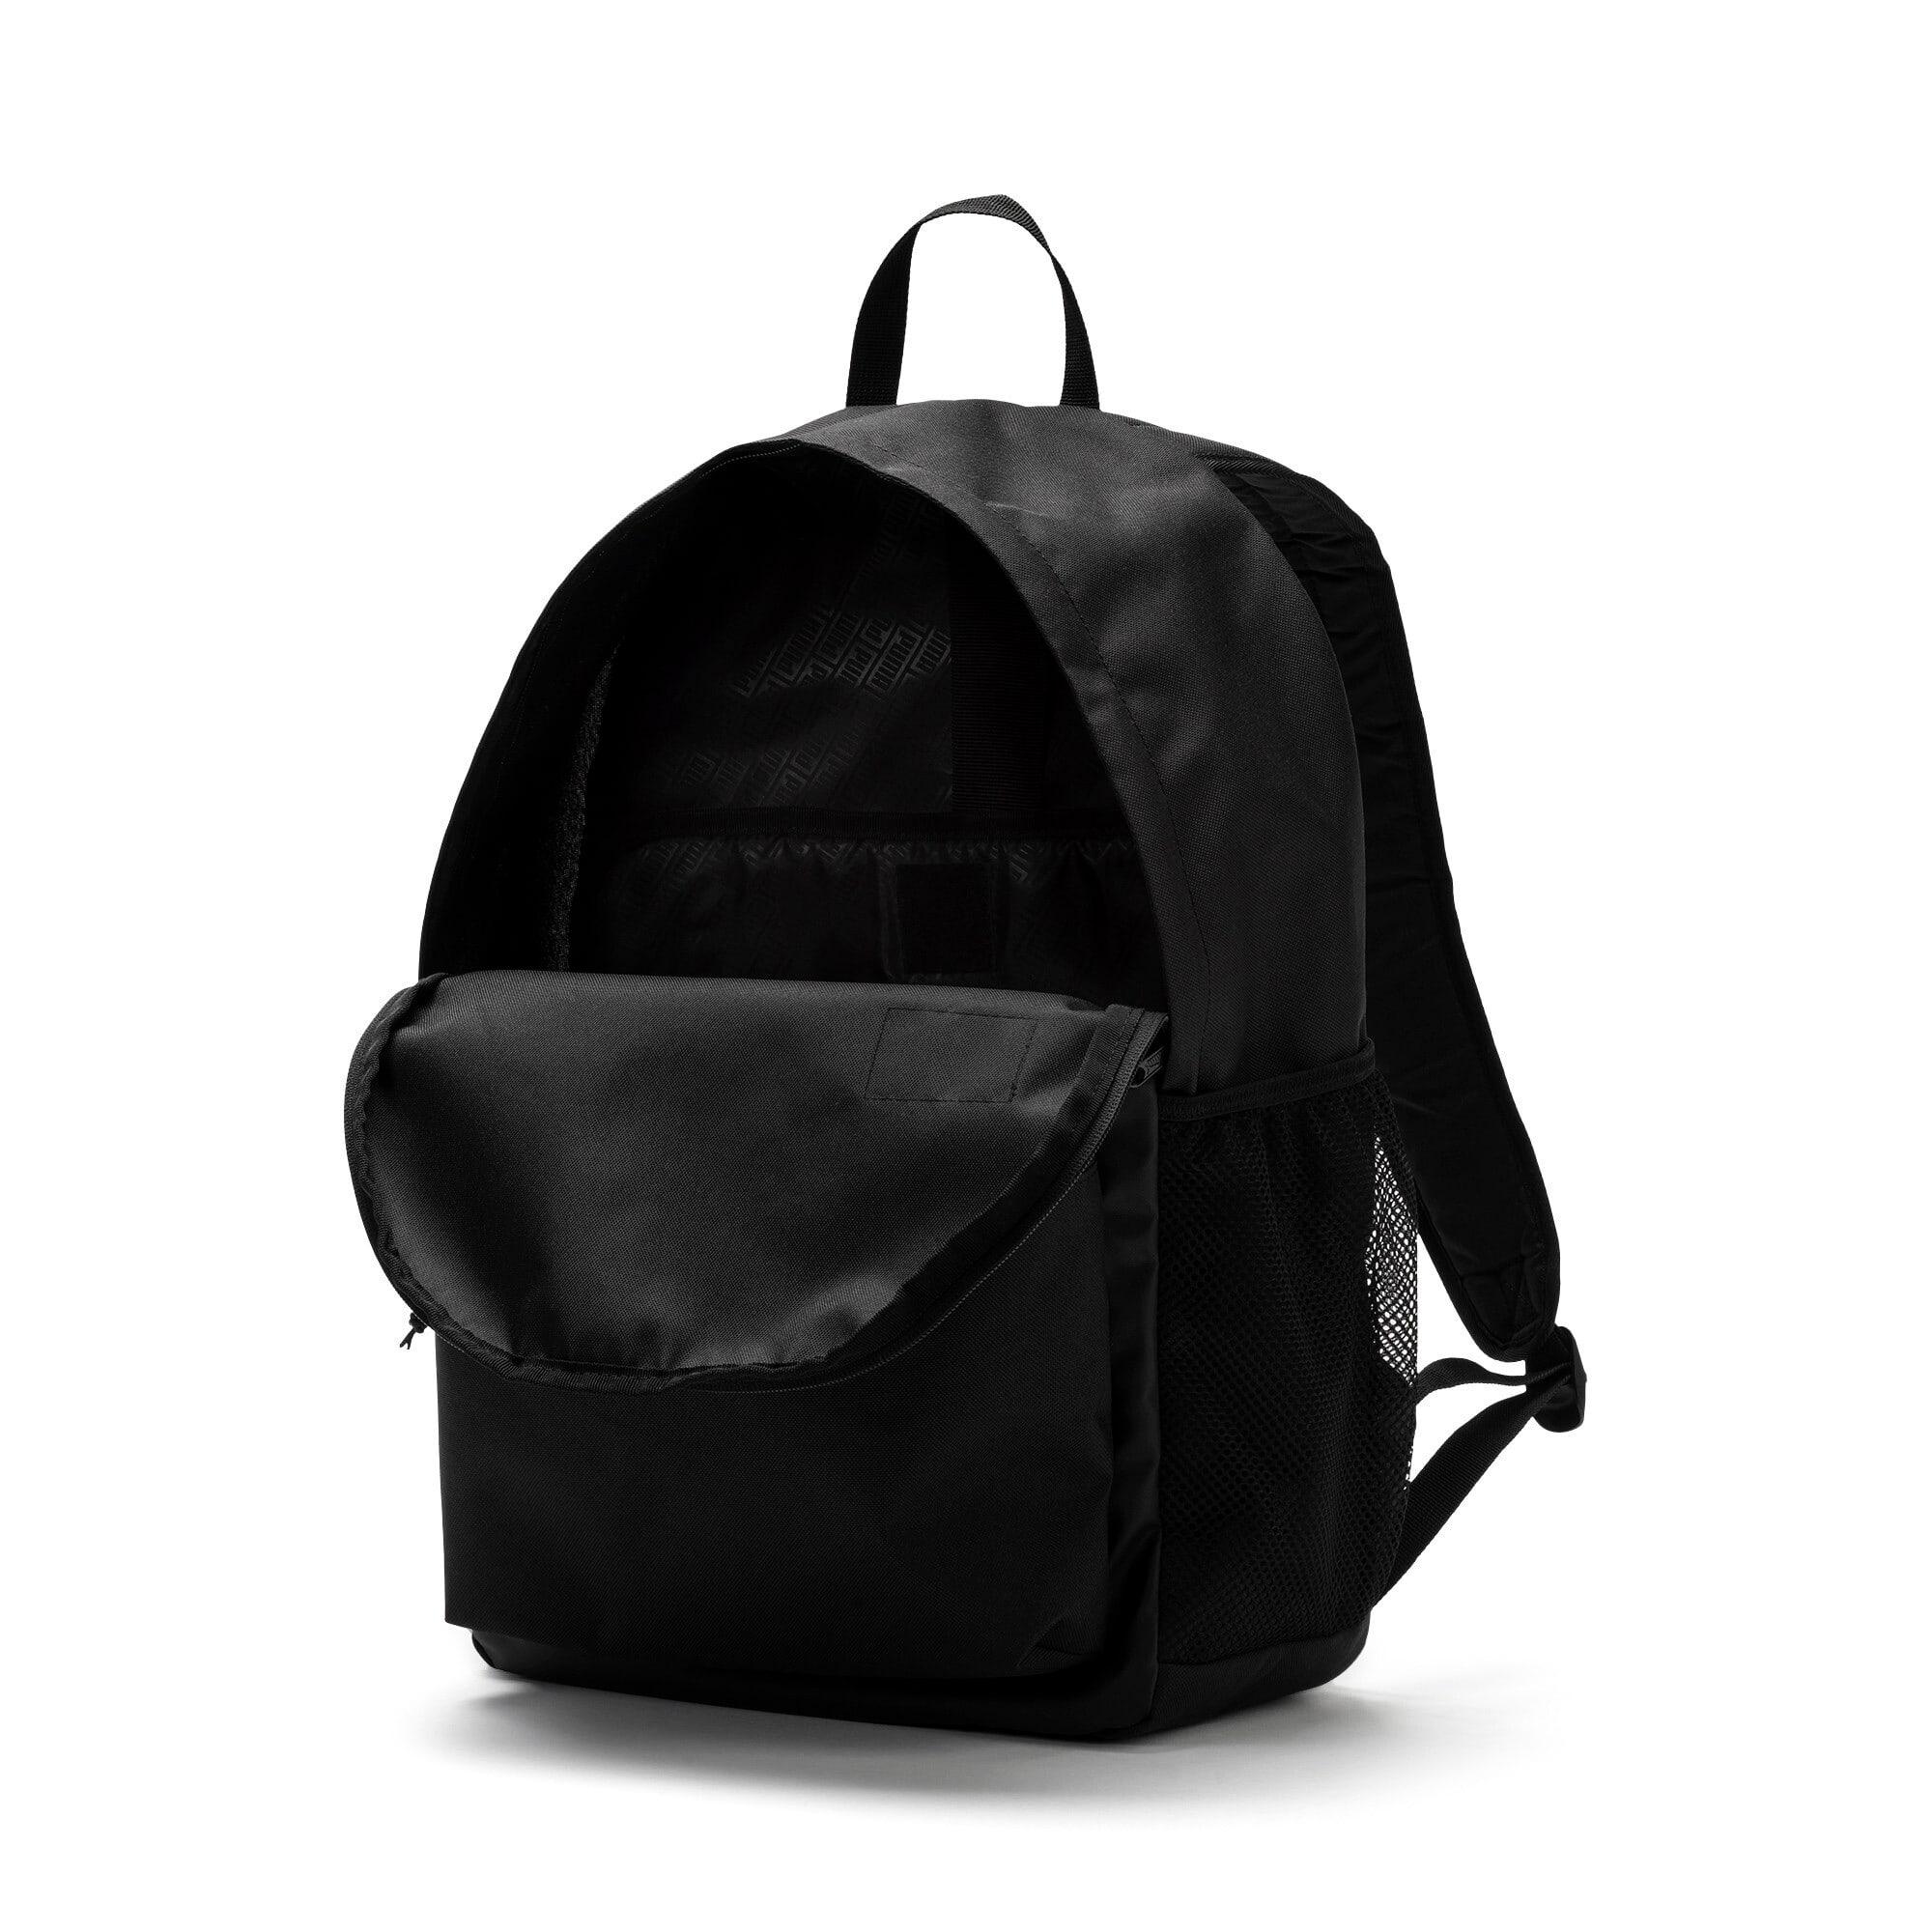 Thumbnail 3 of Academy Backpack, Puma Black, medium